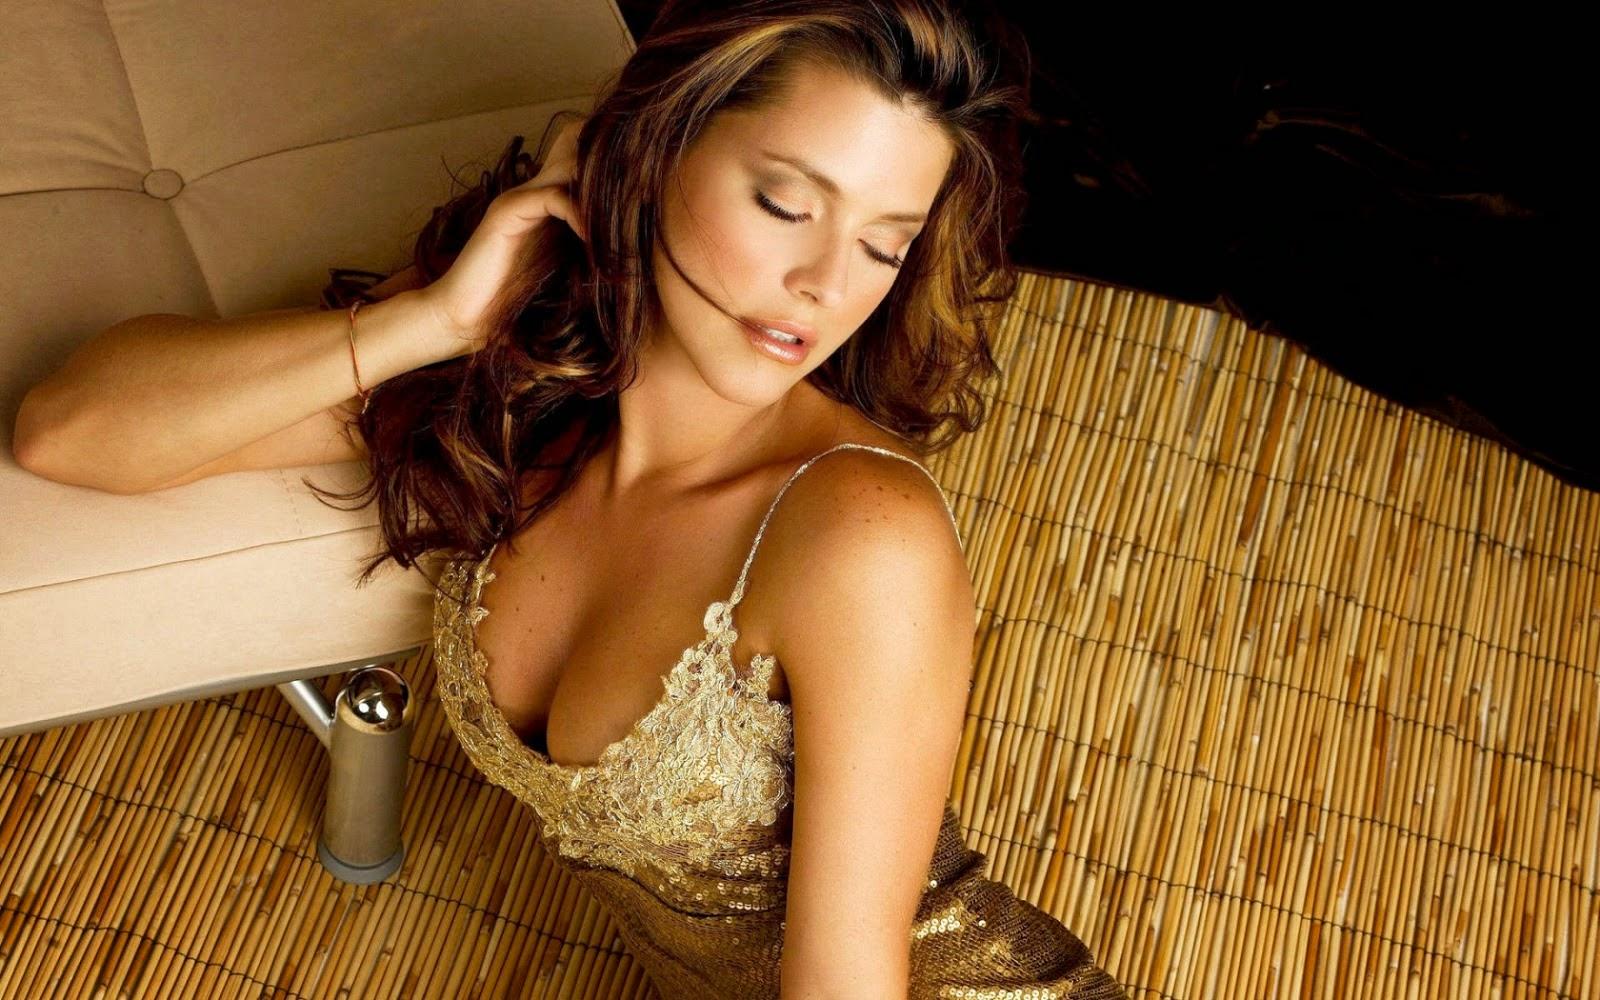 est100 一些攝影(some photos): Alicia Machado, Former Miss Universe ...